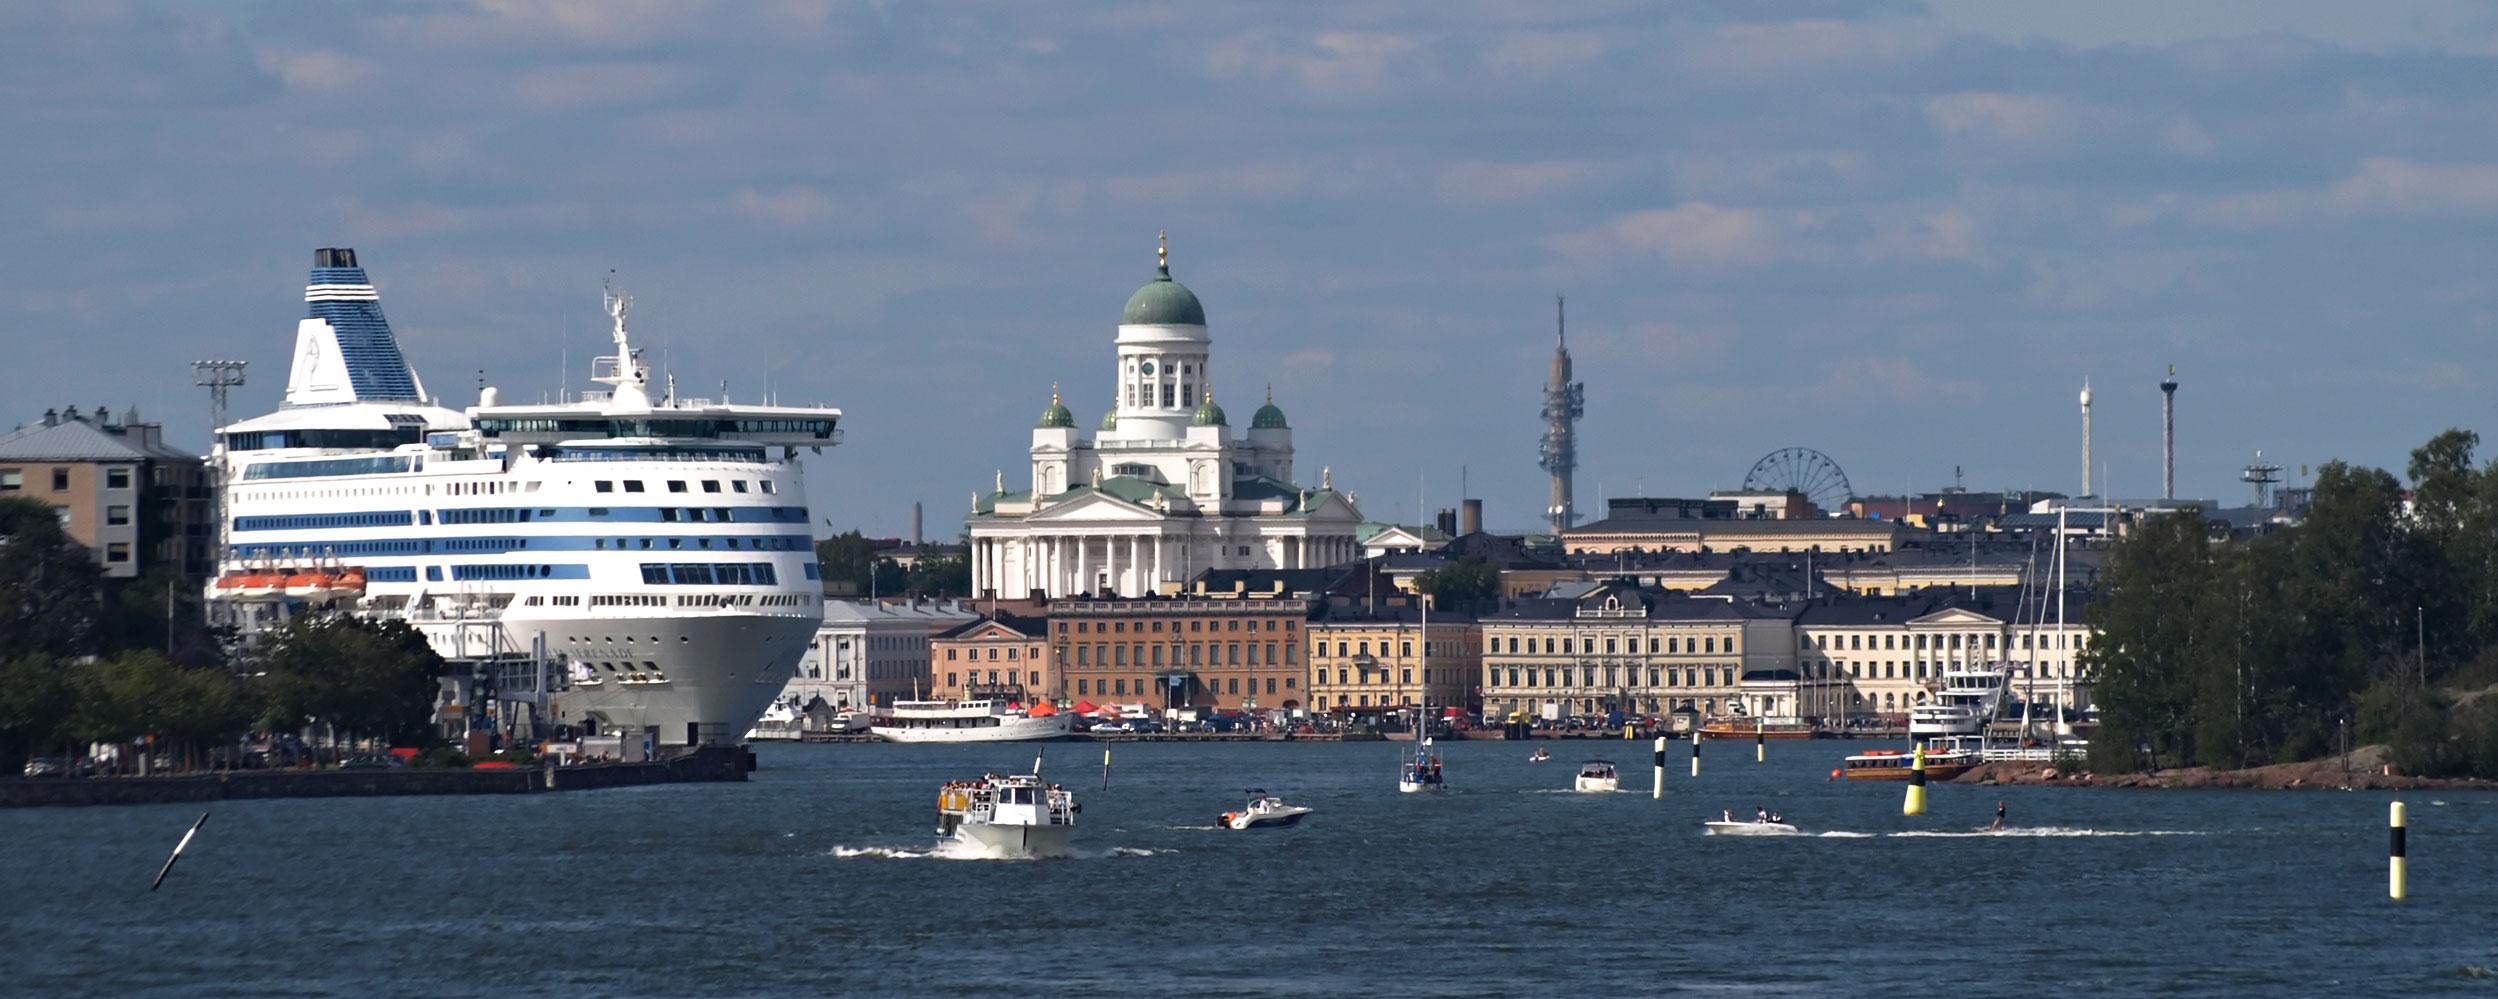 Helsinki yacht club photo